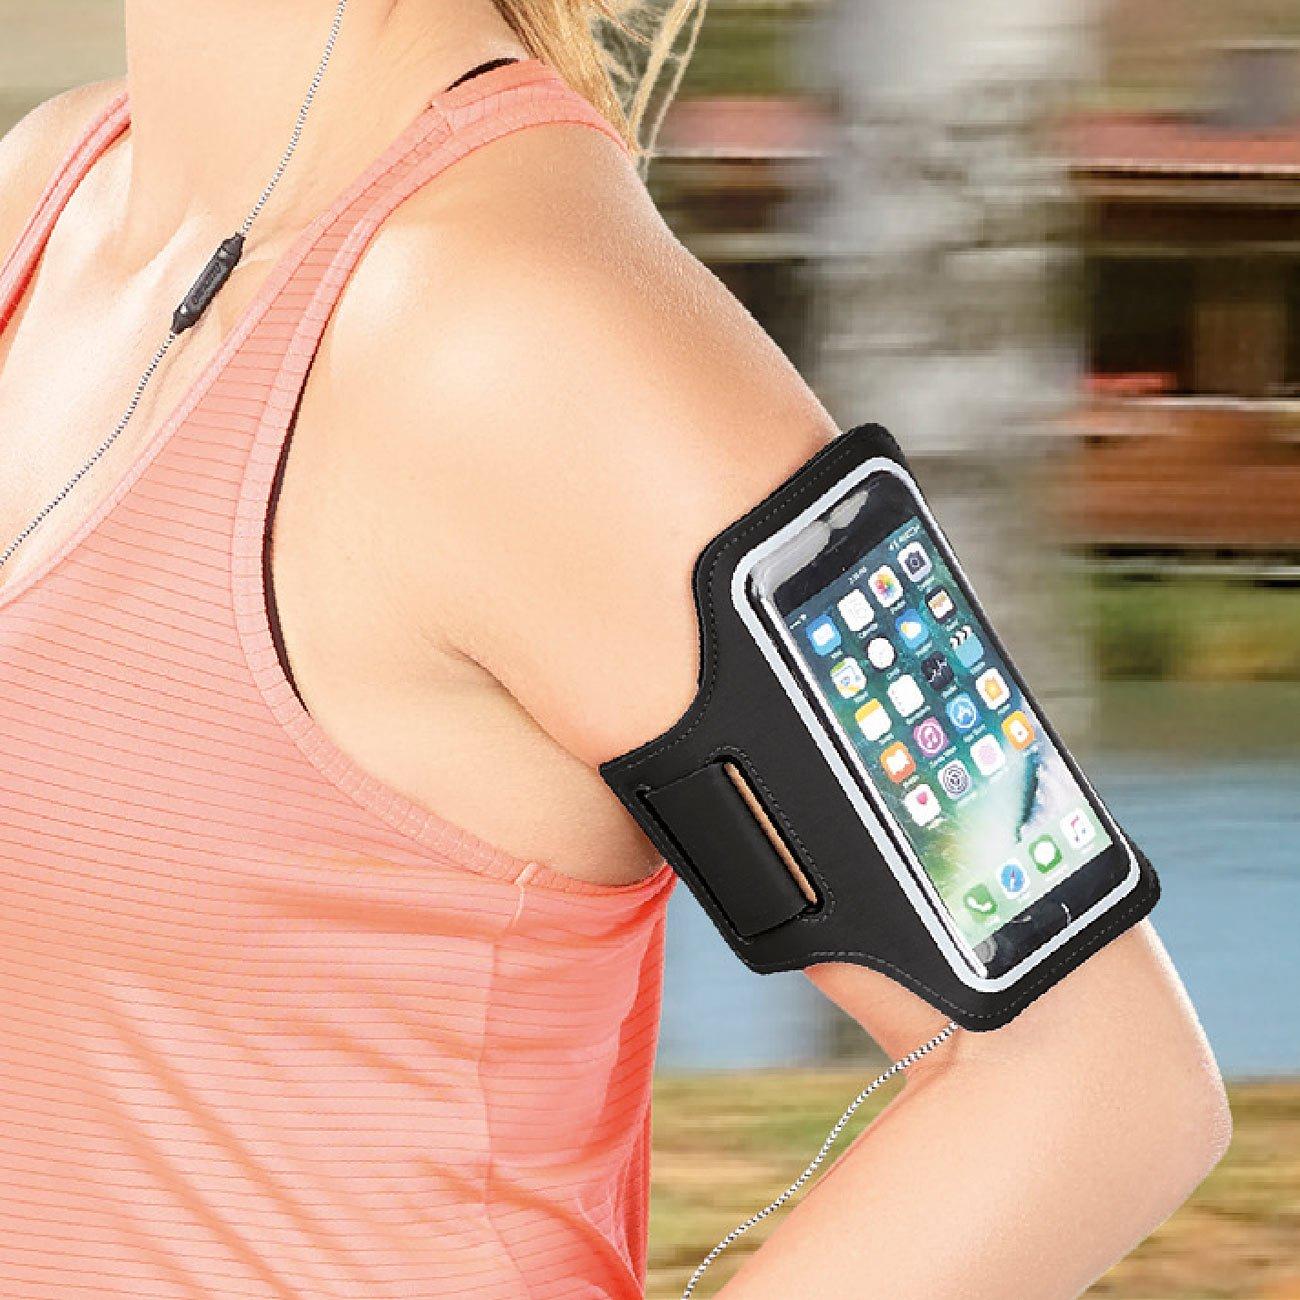 Sport-Armband-Tasche f/ür Smartphones /& iPhones bis 5,5 PEARL Sports Handy Armband schwei/ßfest Handy Arm